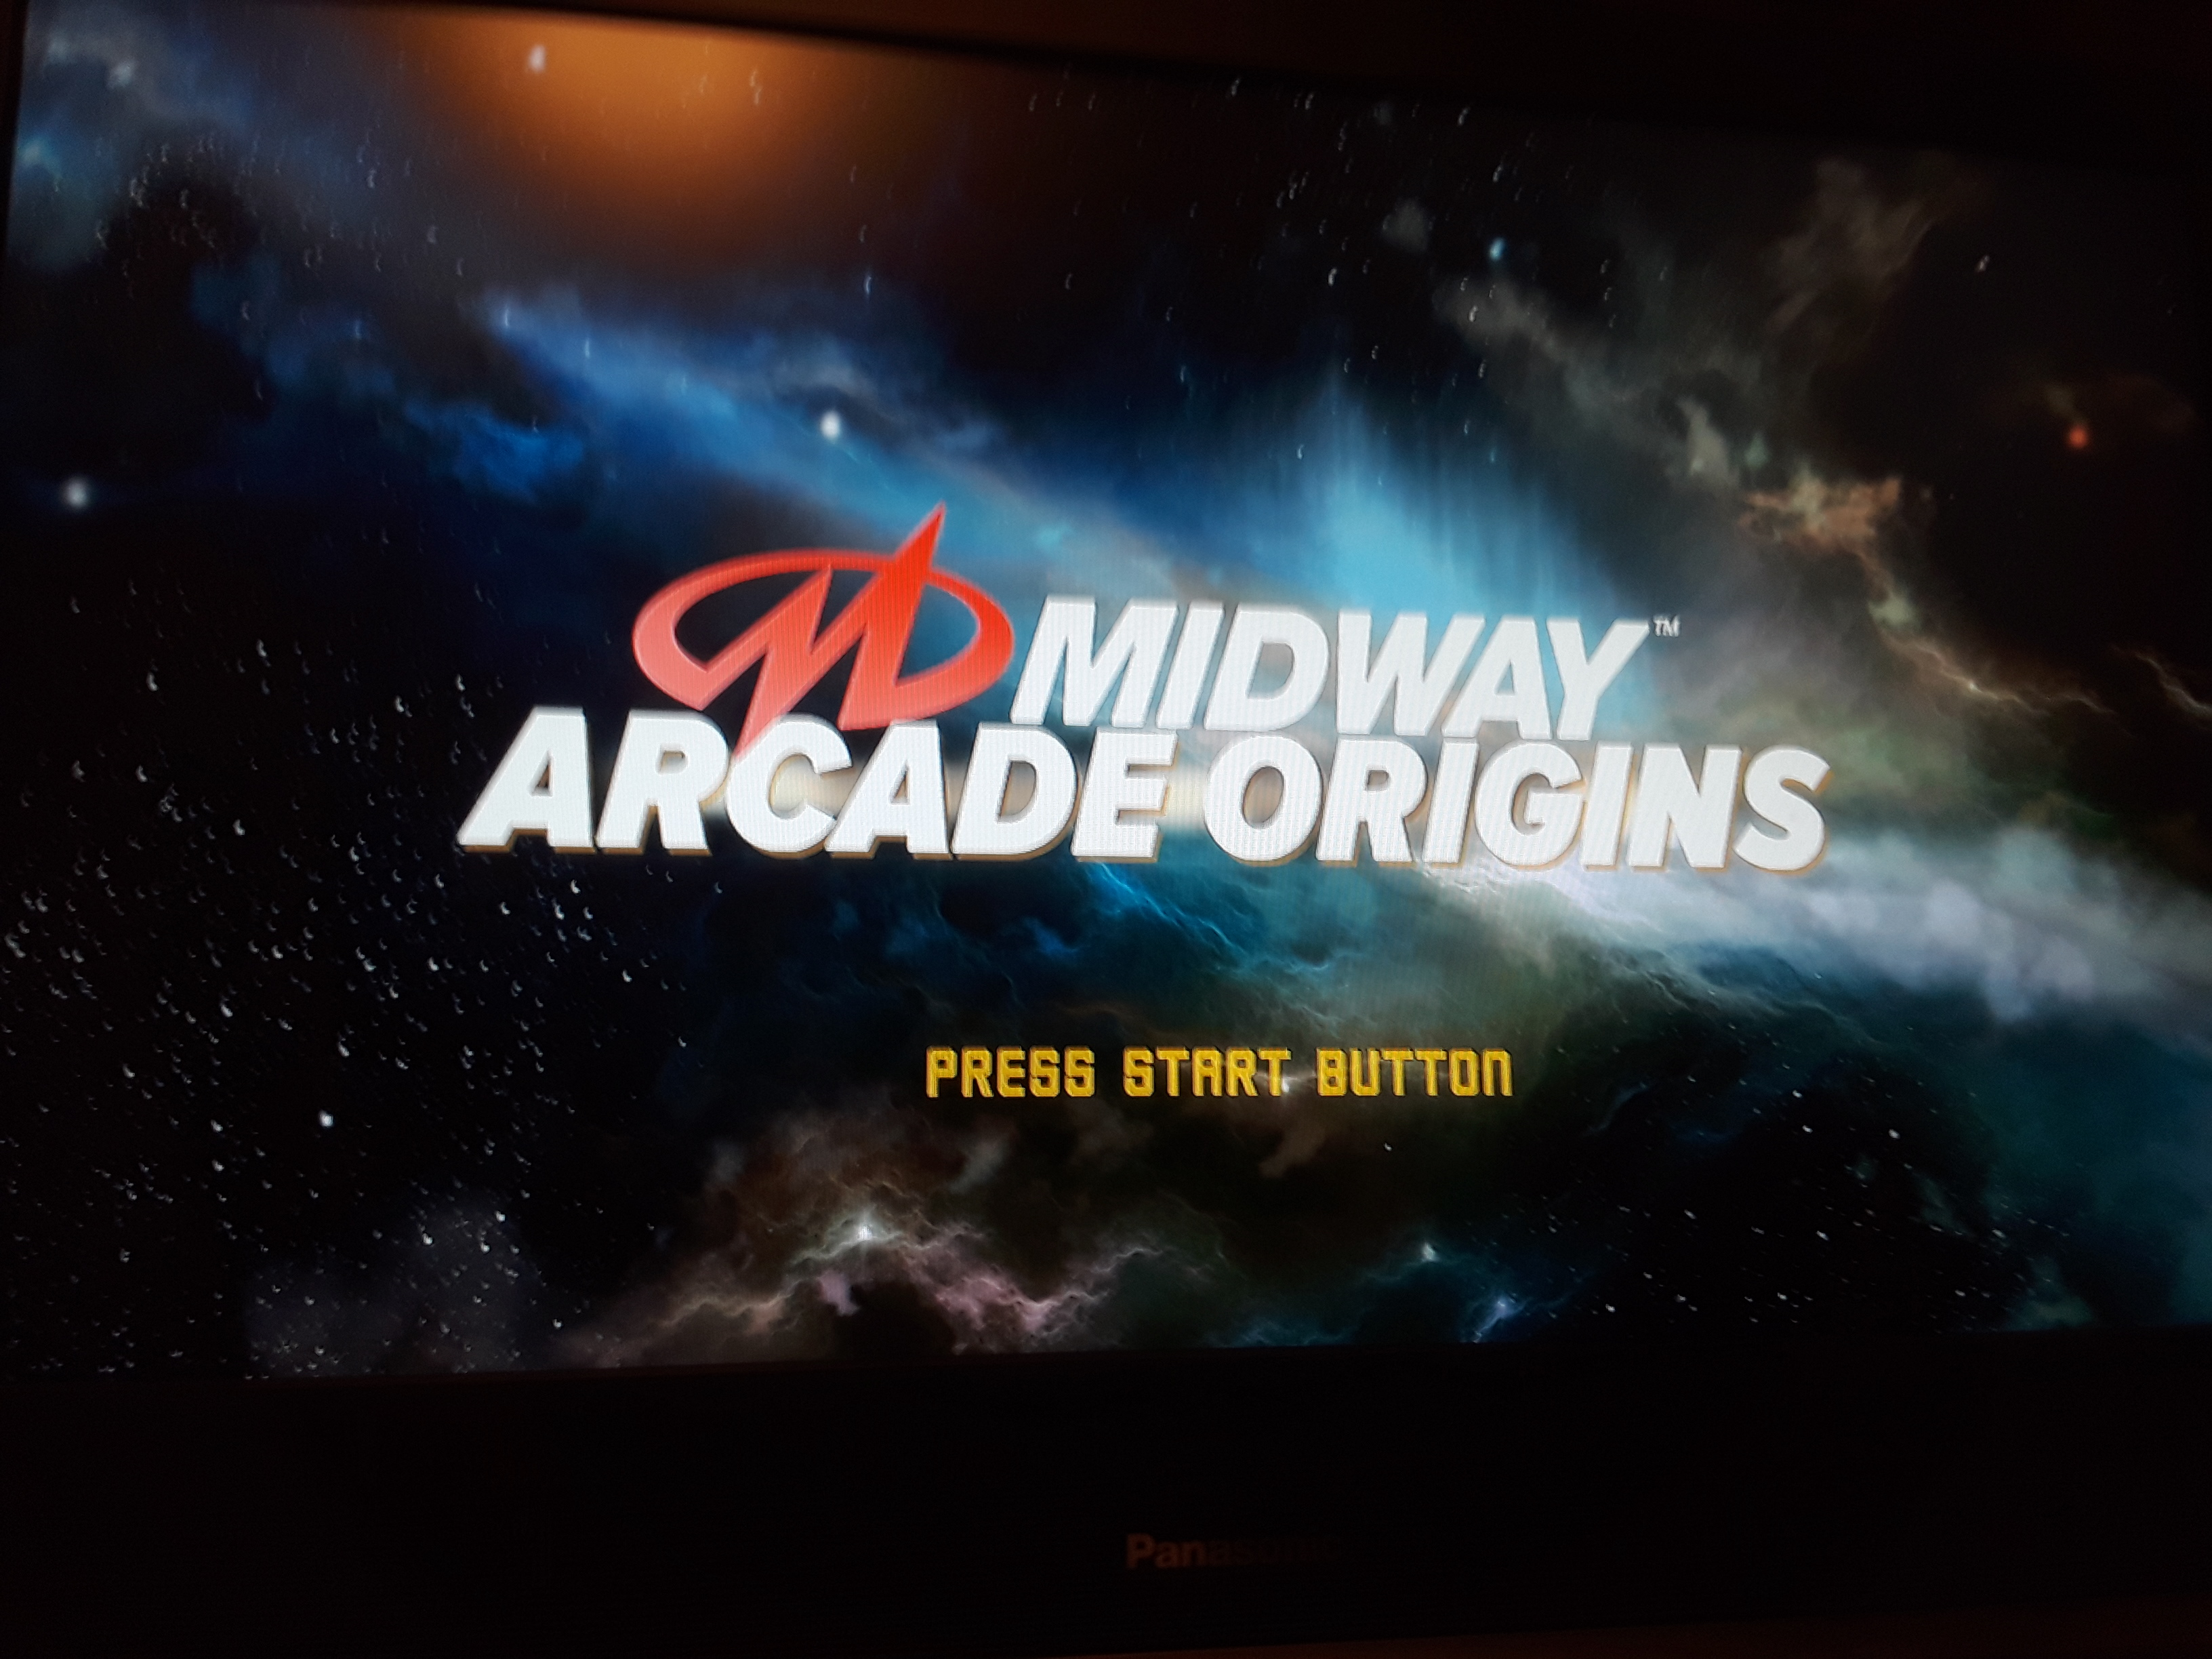 JML101582: Midway Arcade Origins: Gauntlet [Hard] (Playstation 3) 3,160 points on 2018-09-19 22:44:15